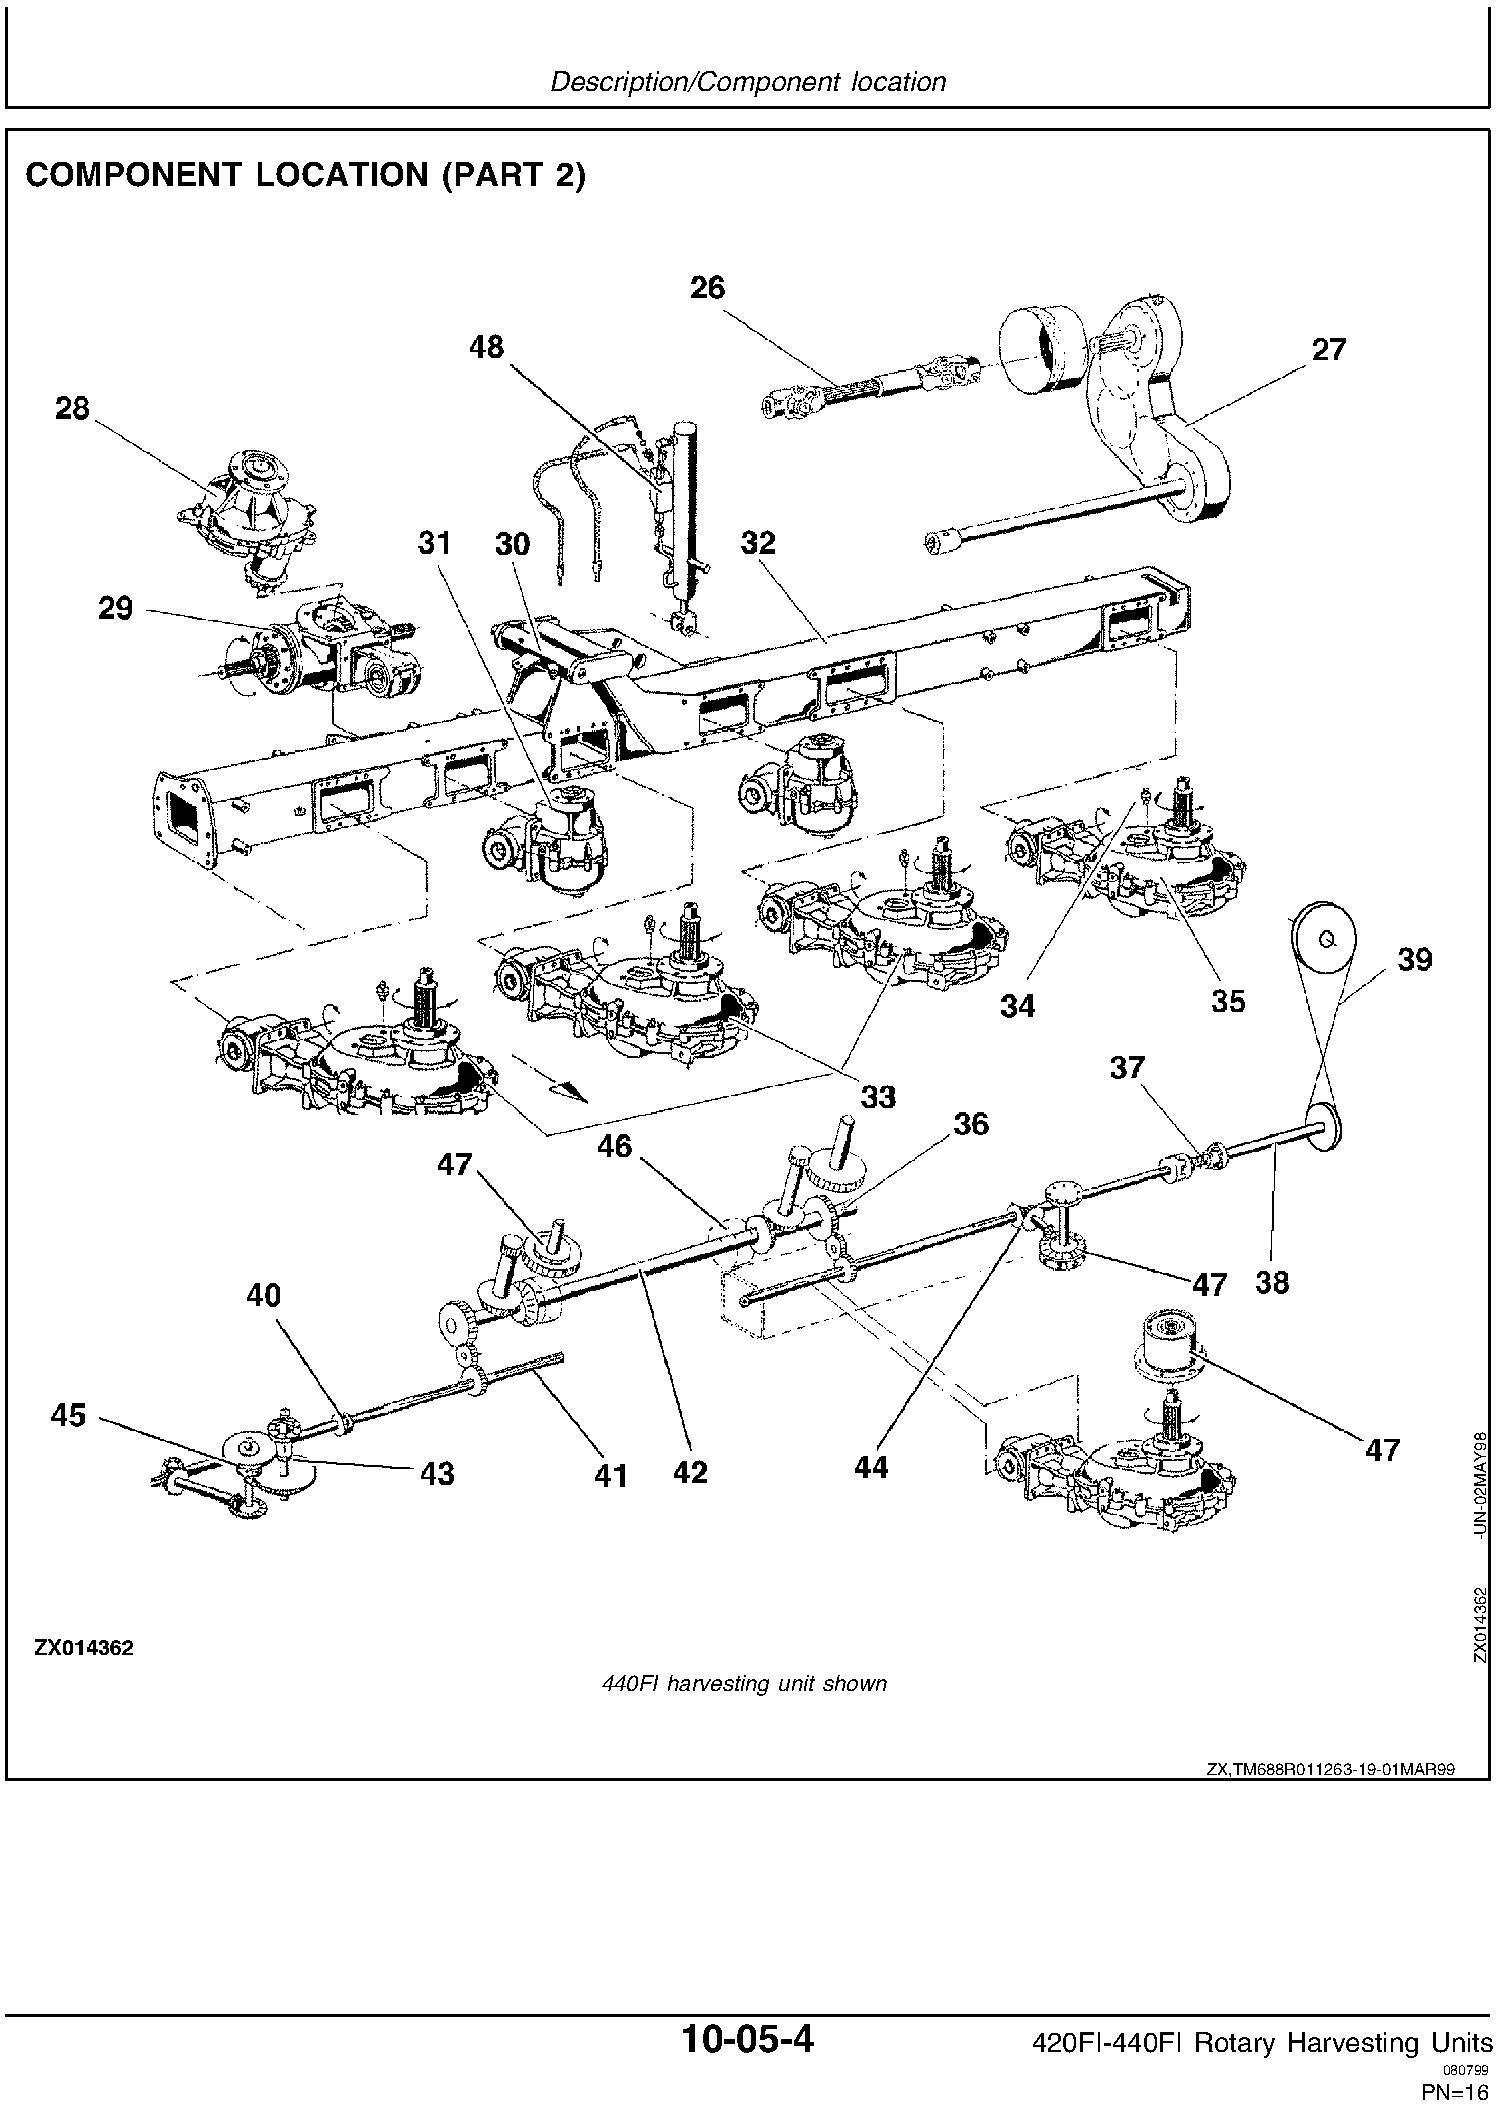 New Holland 420FI, 440FI Rotary Harvesting Headers Service Manual - 2